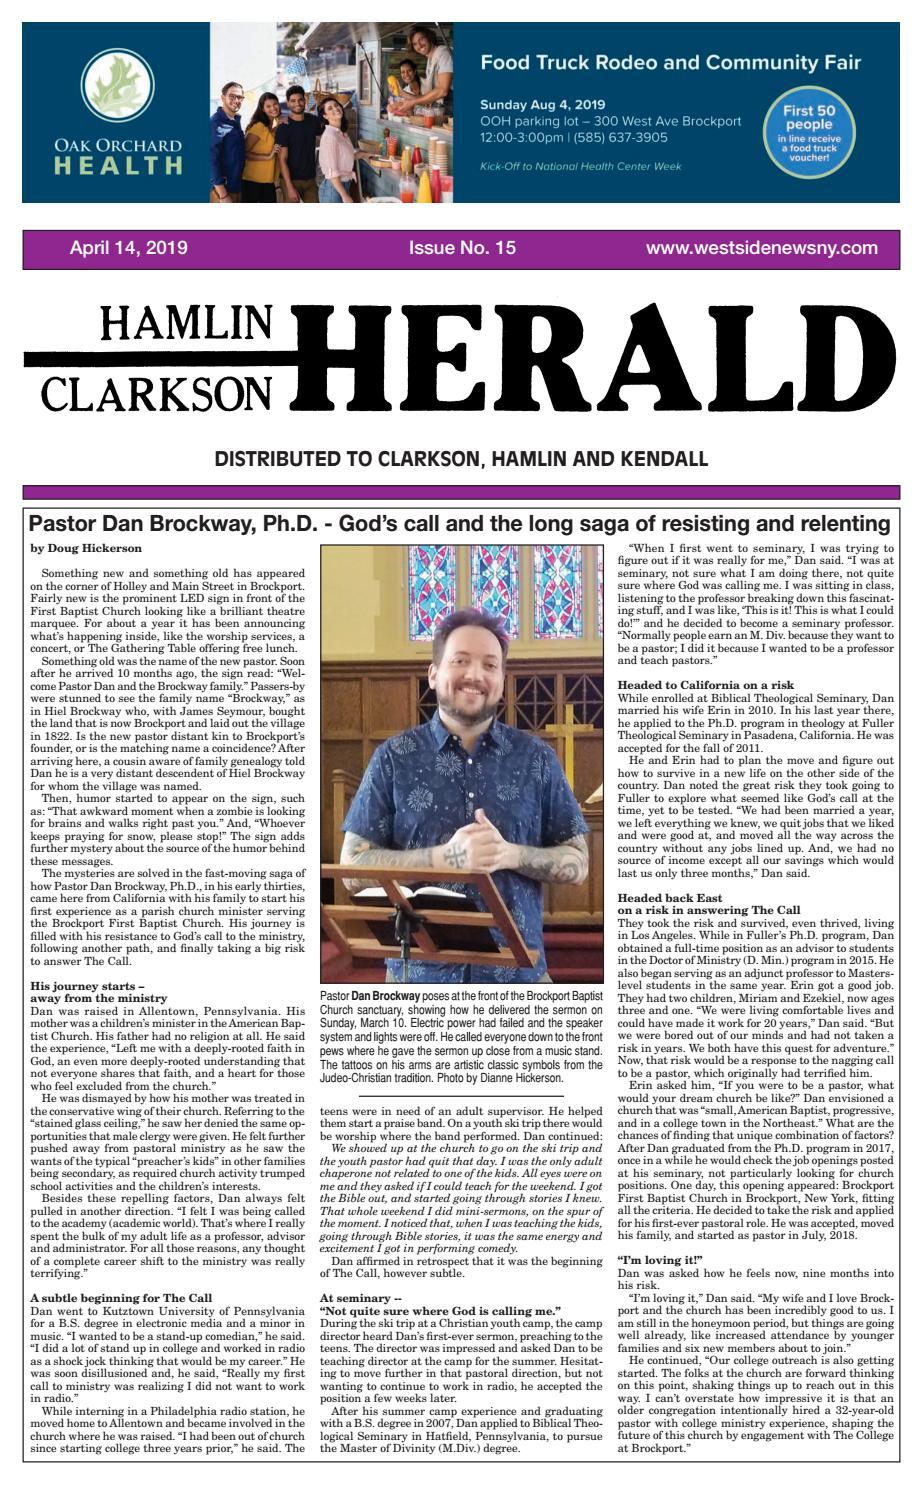 Hamlin-Clarkson Herald - April 14, 2019 by Westside News Inc  - issuu